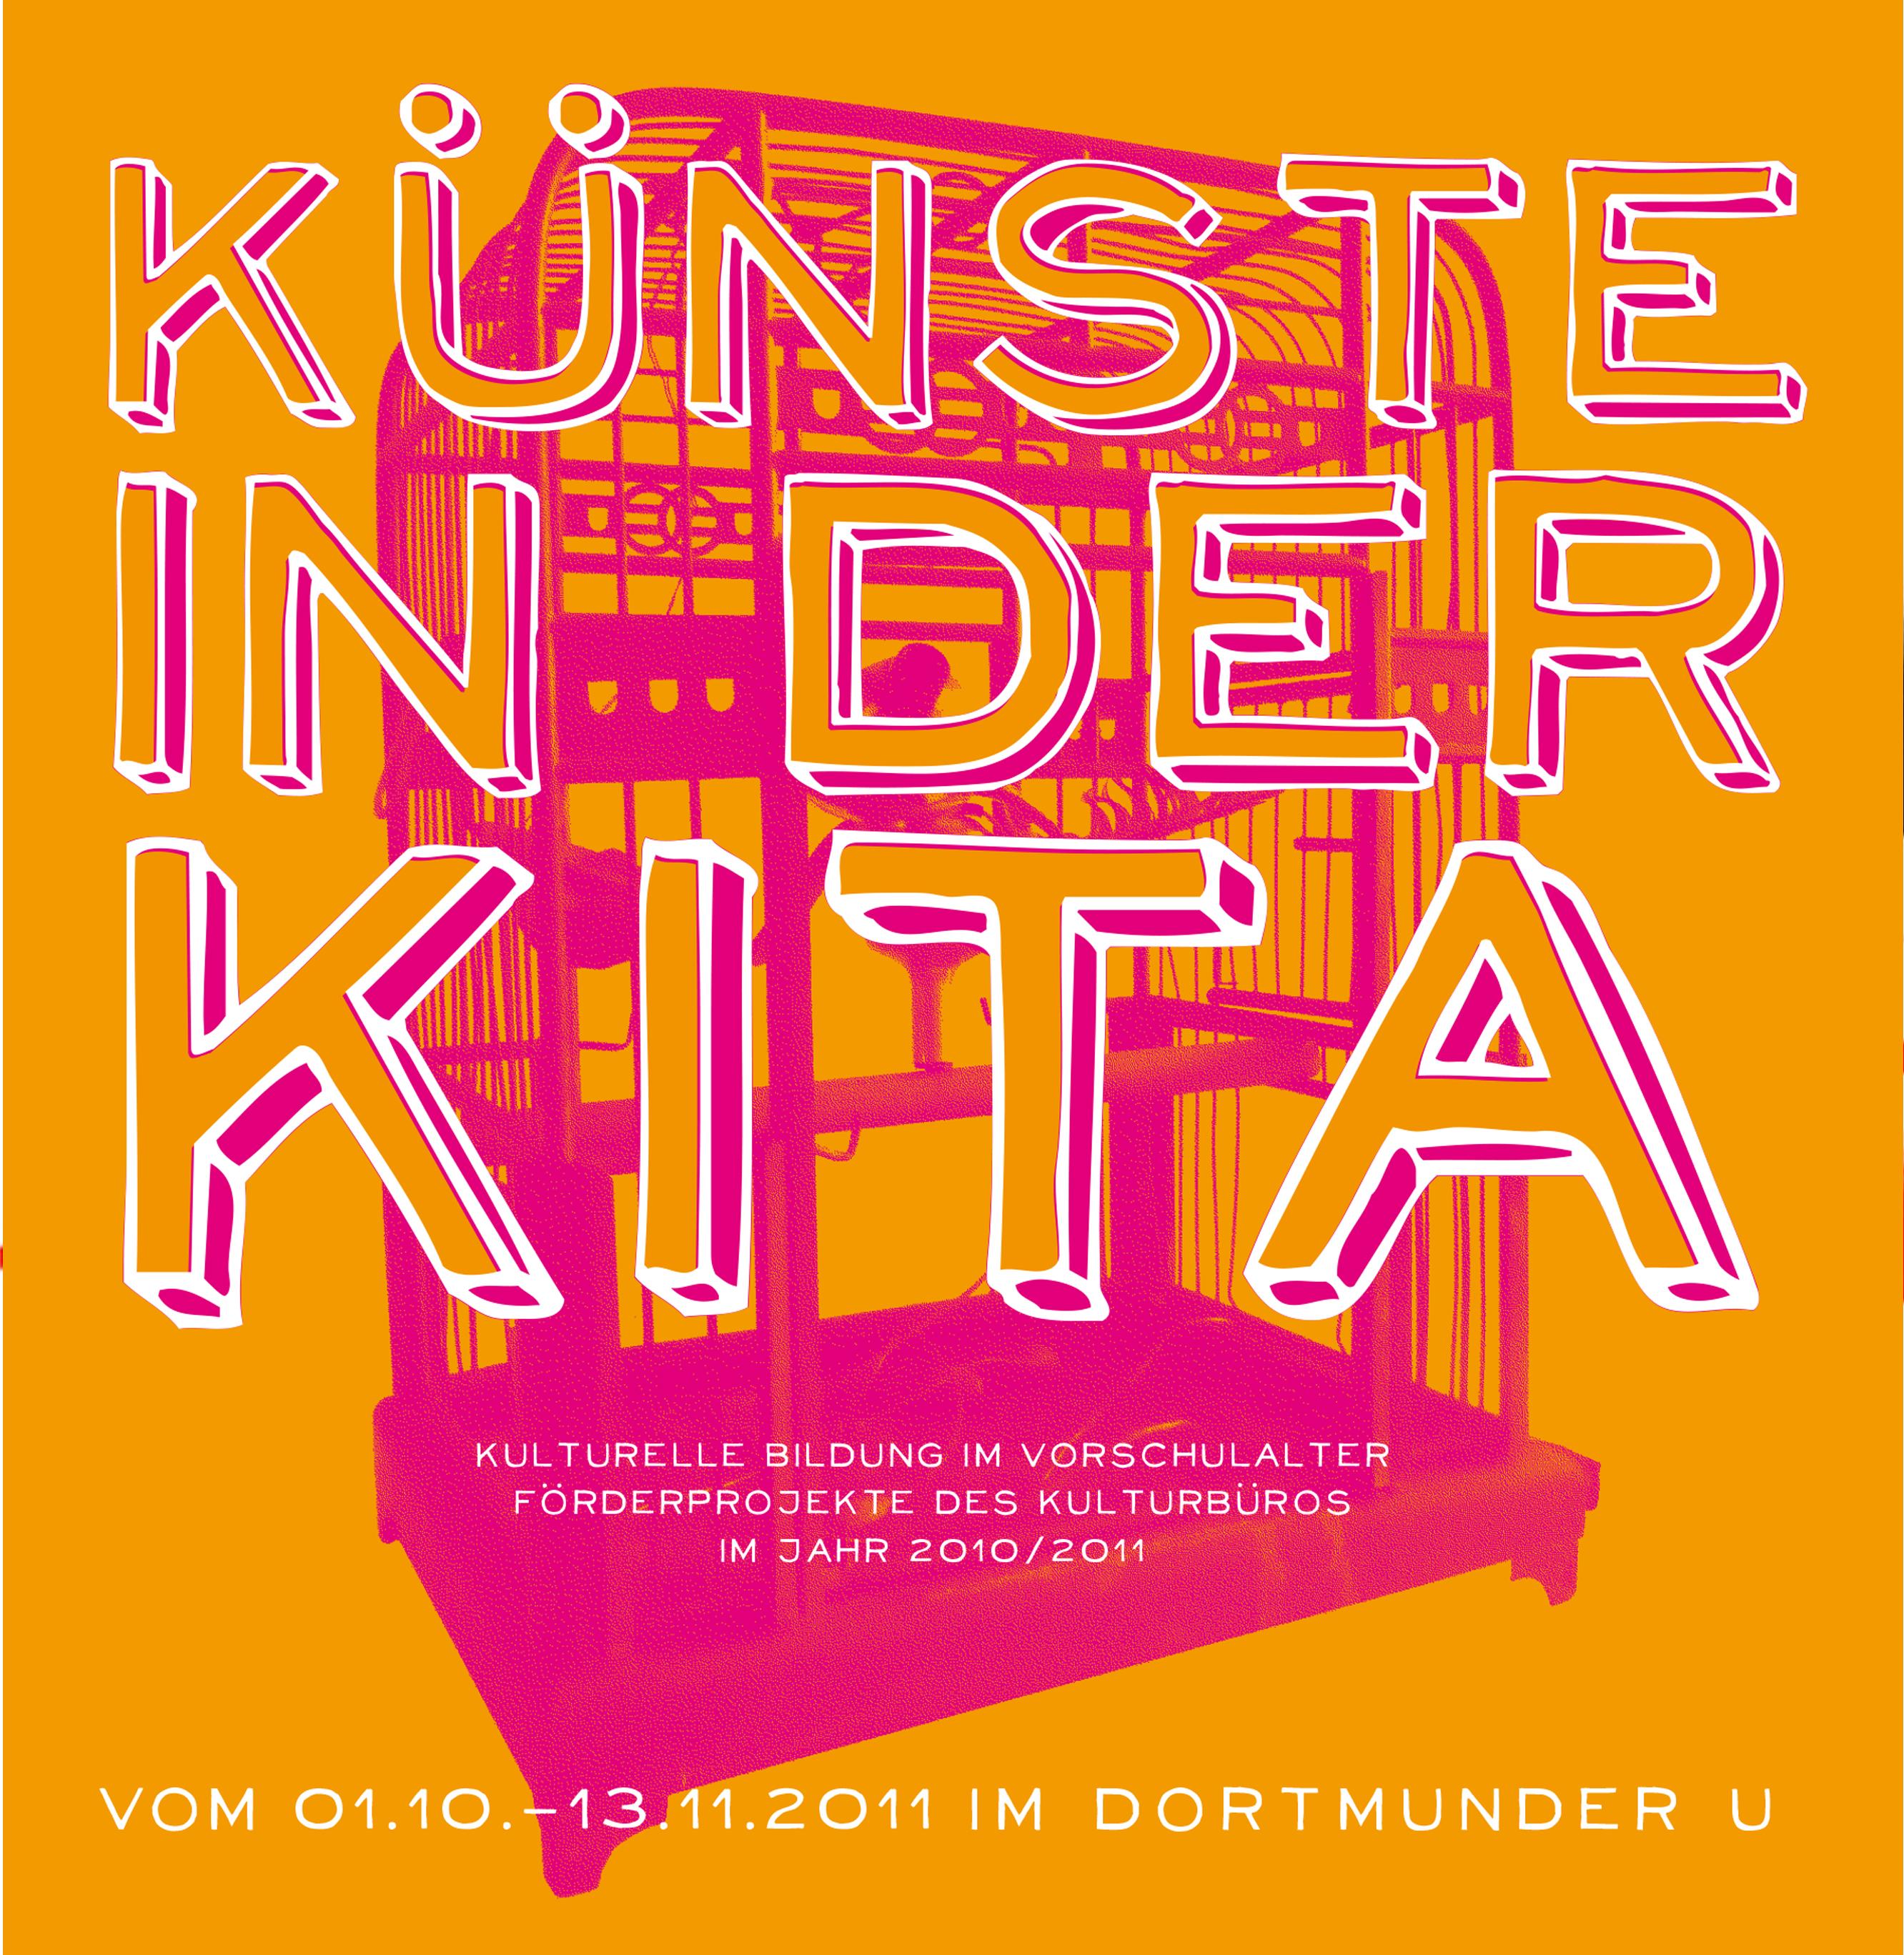 künsteinderkita_2011